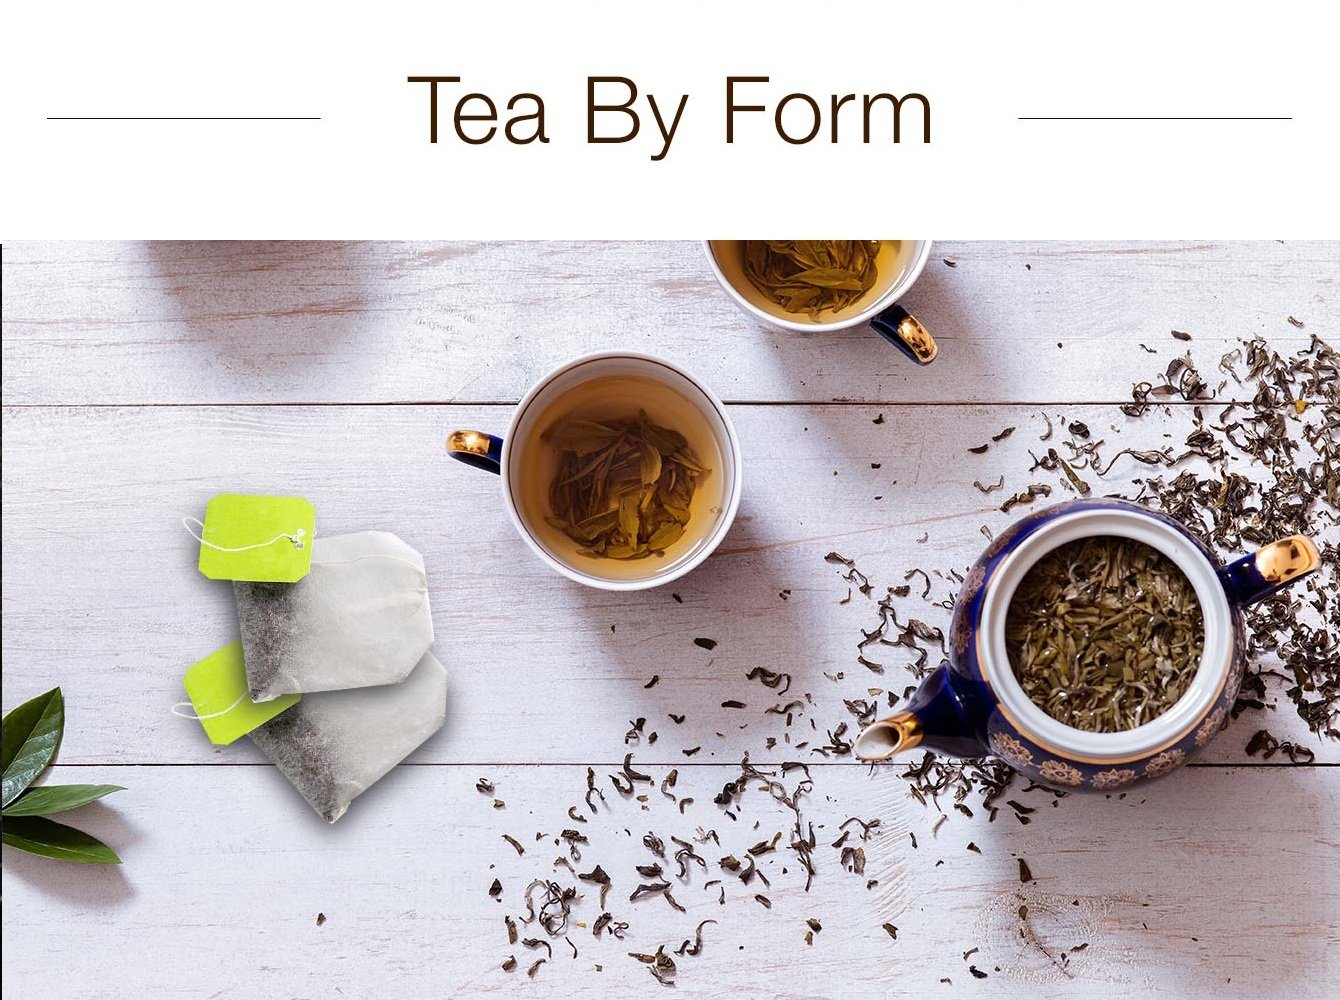 TeaByForm